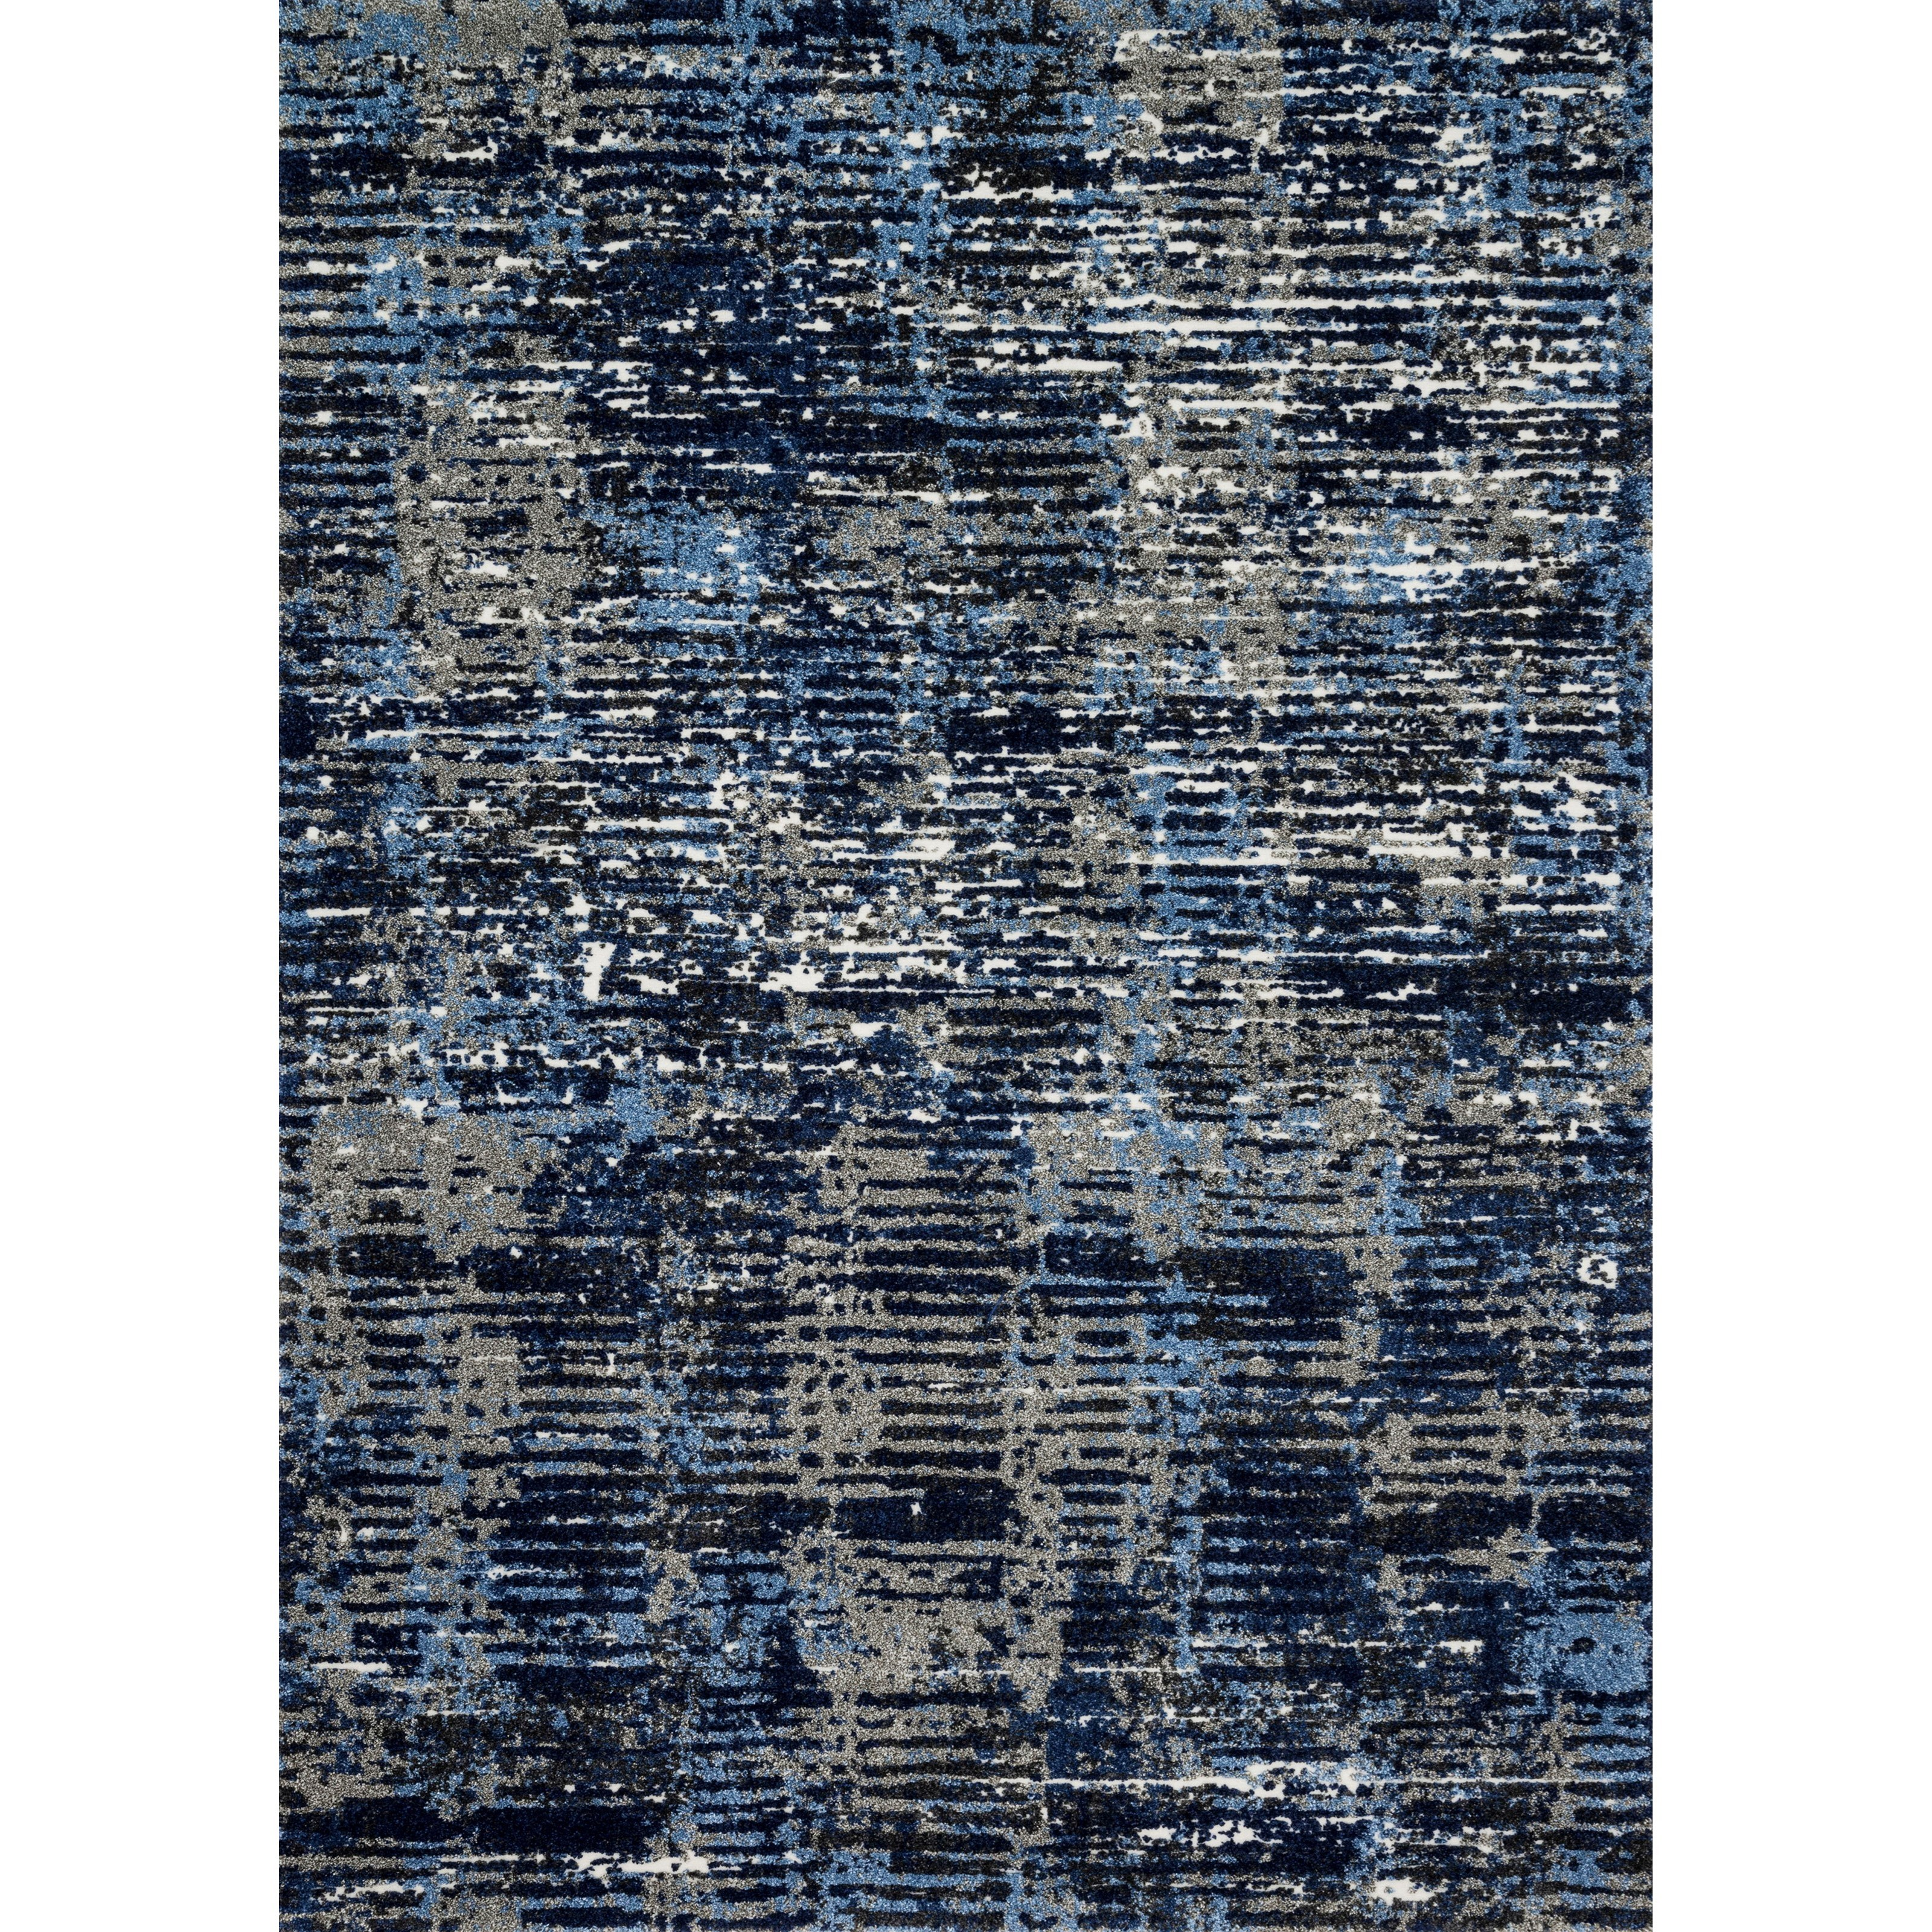 "Viera 8'11"" x 12'5"" Dark Blue / Grey Rug by Loloi Rugs at Virginia Furniture Market"